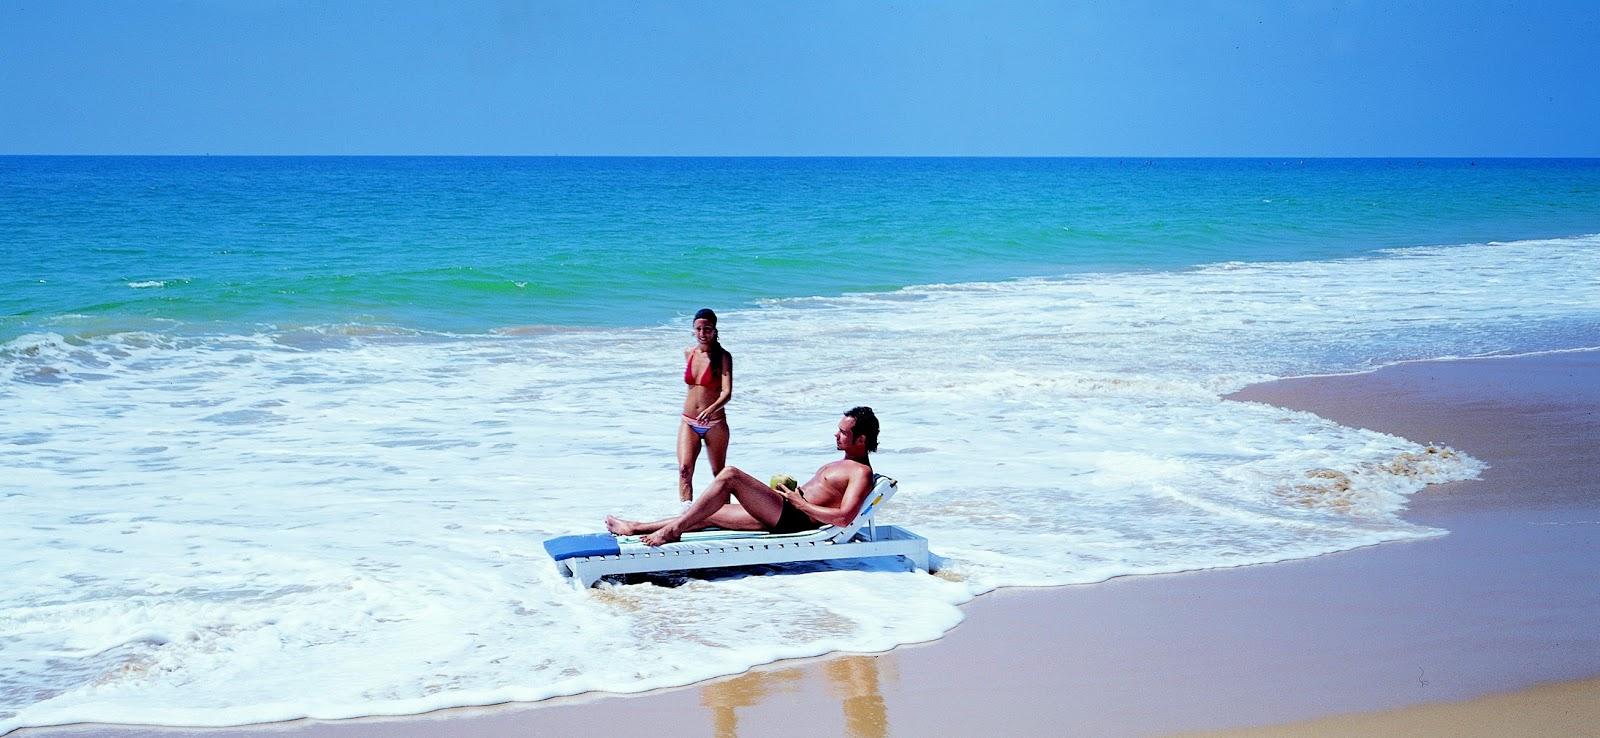 Beaches Hd Picsseanature Picshd Beaches Imageswide Screen Beach